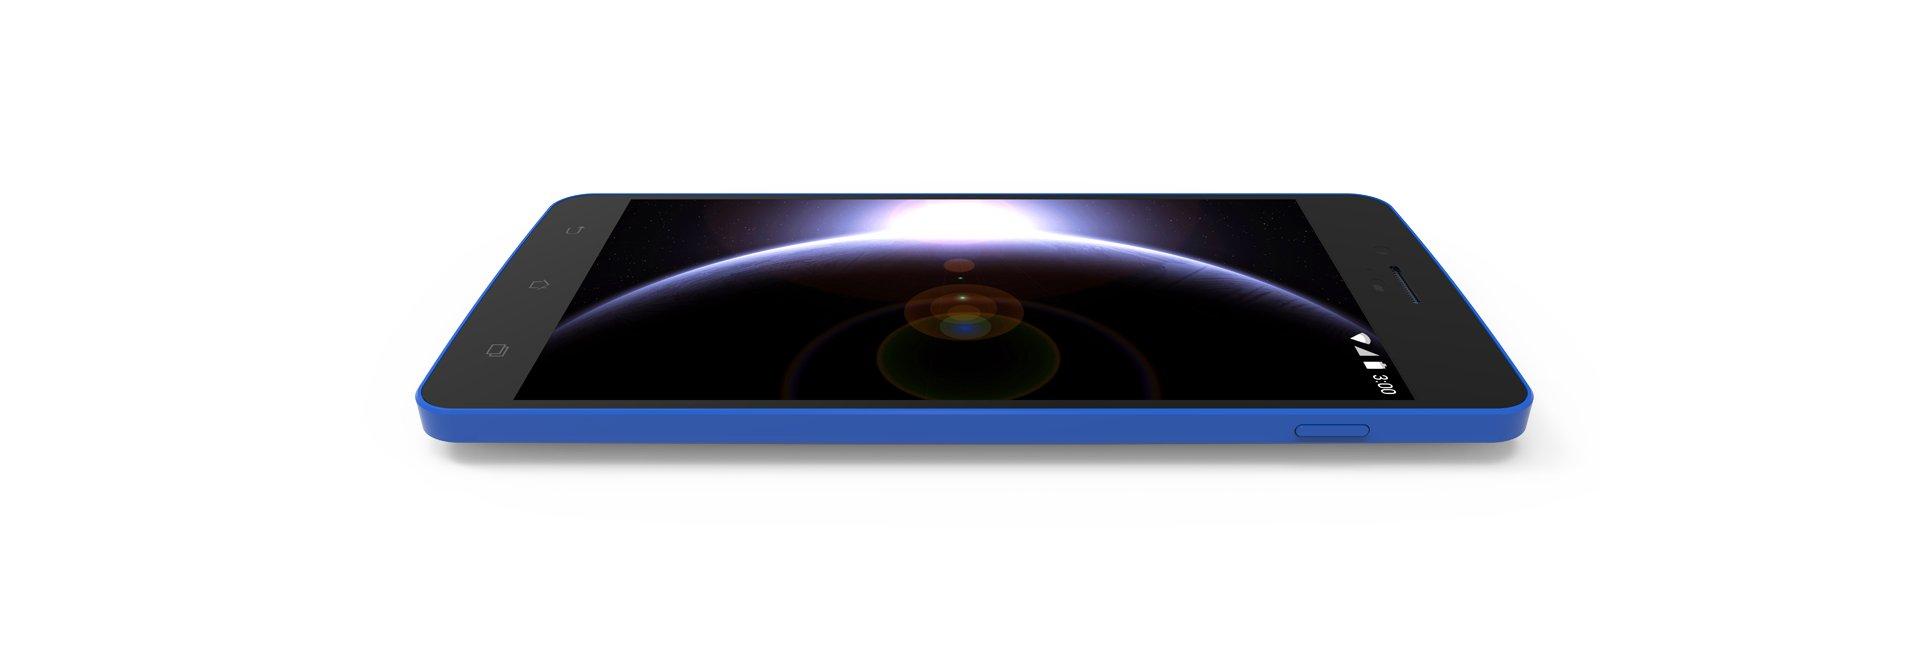 Stonex One #Galileo, al via i preordini a soli 299€